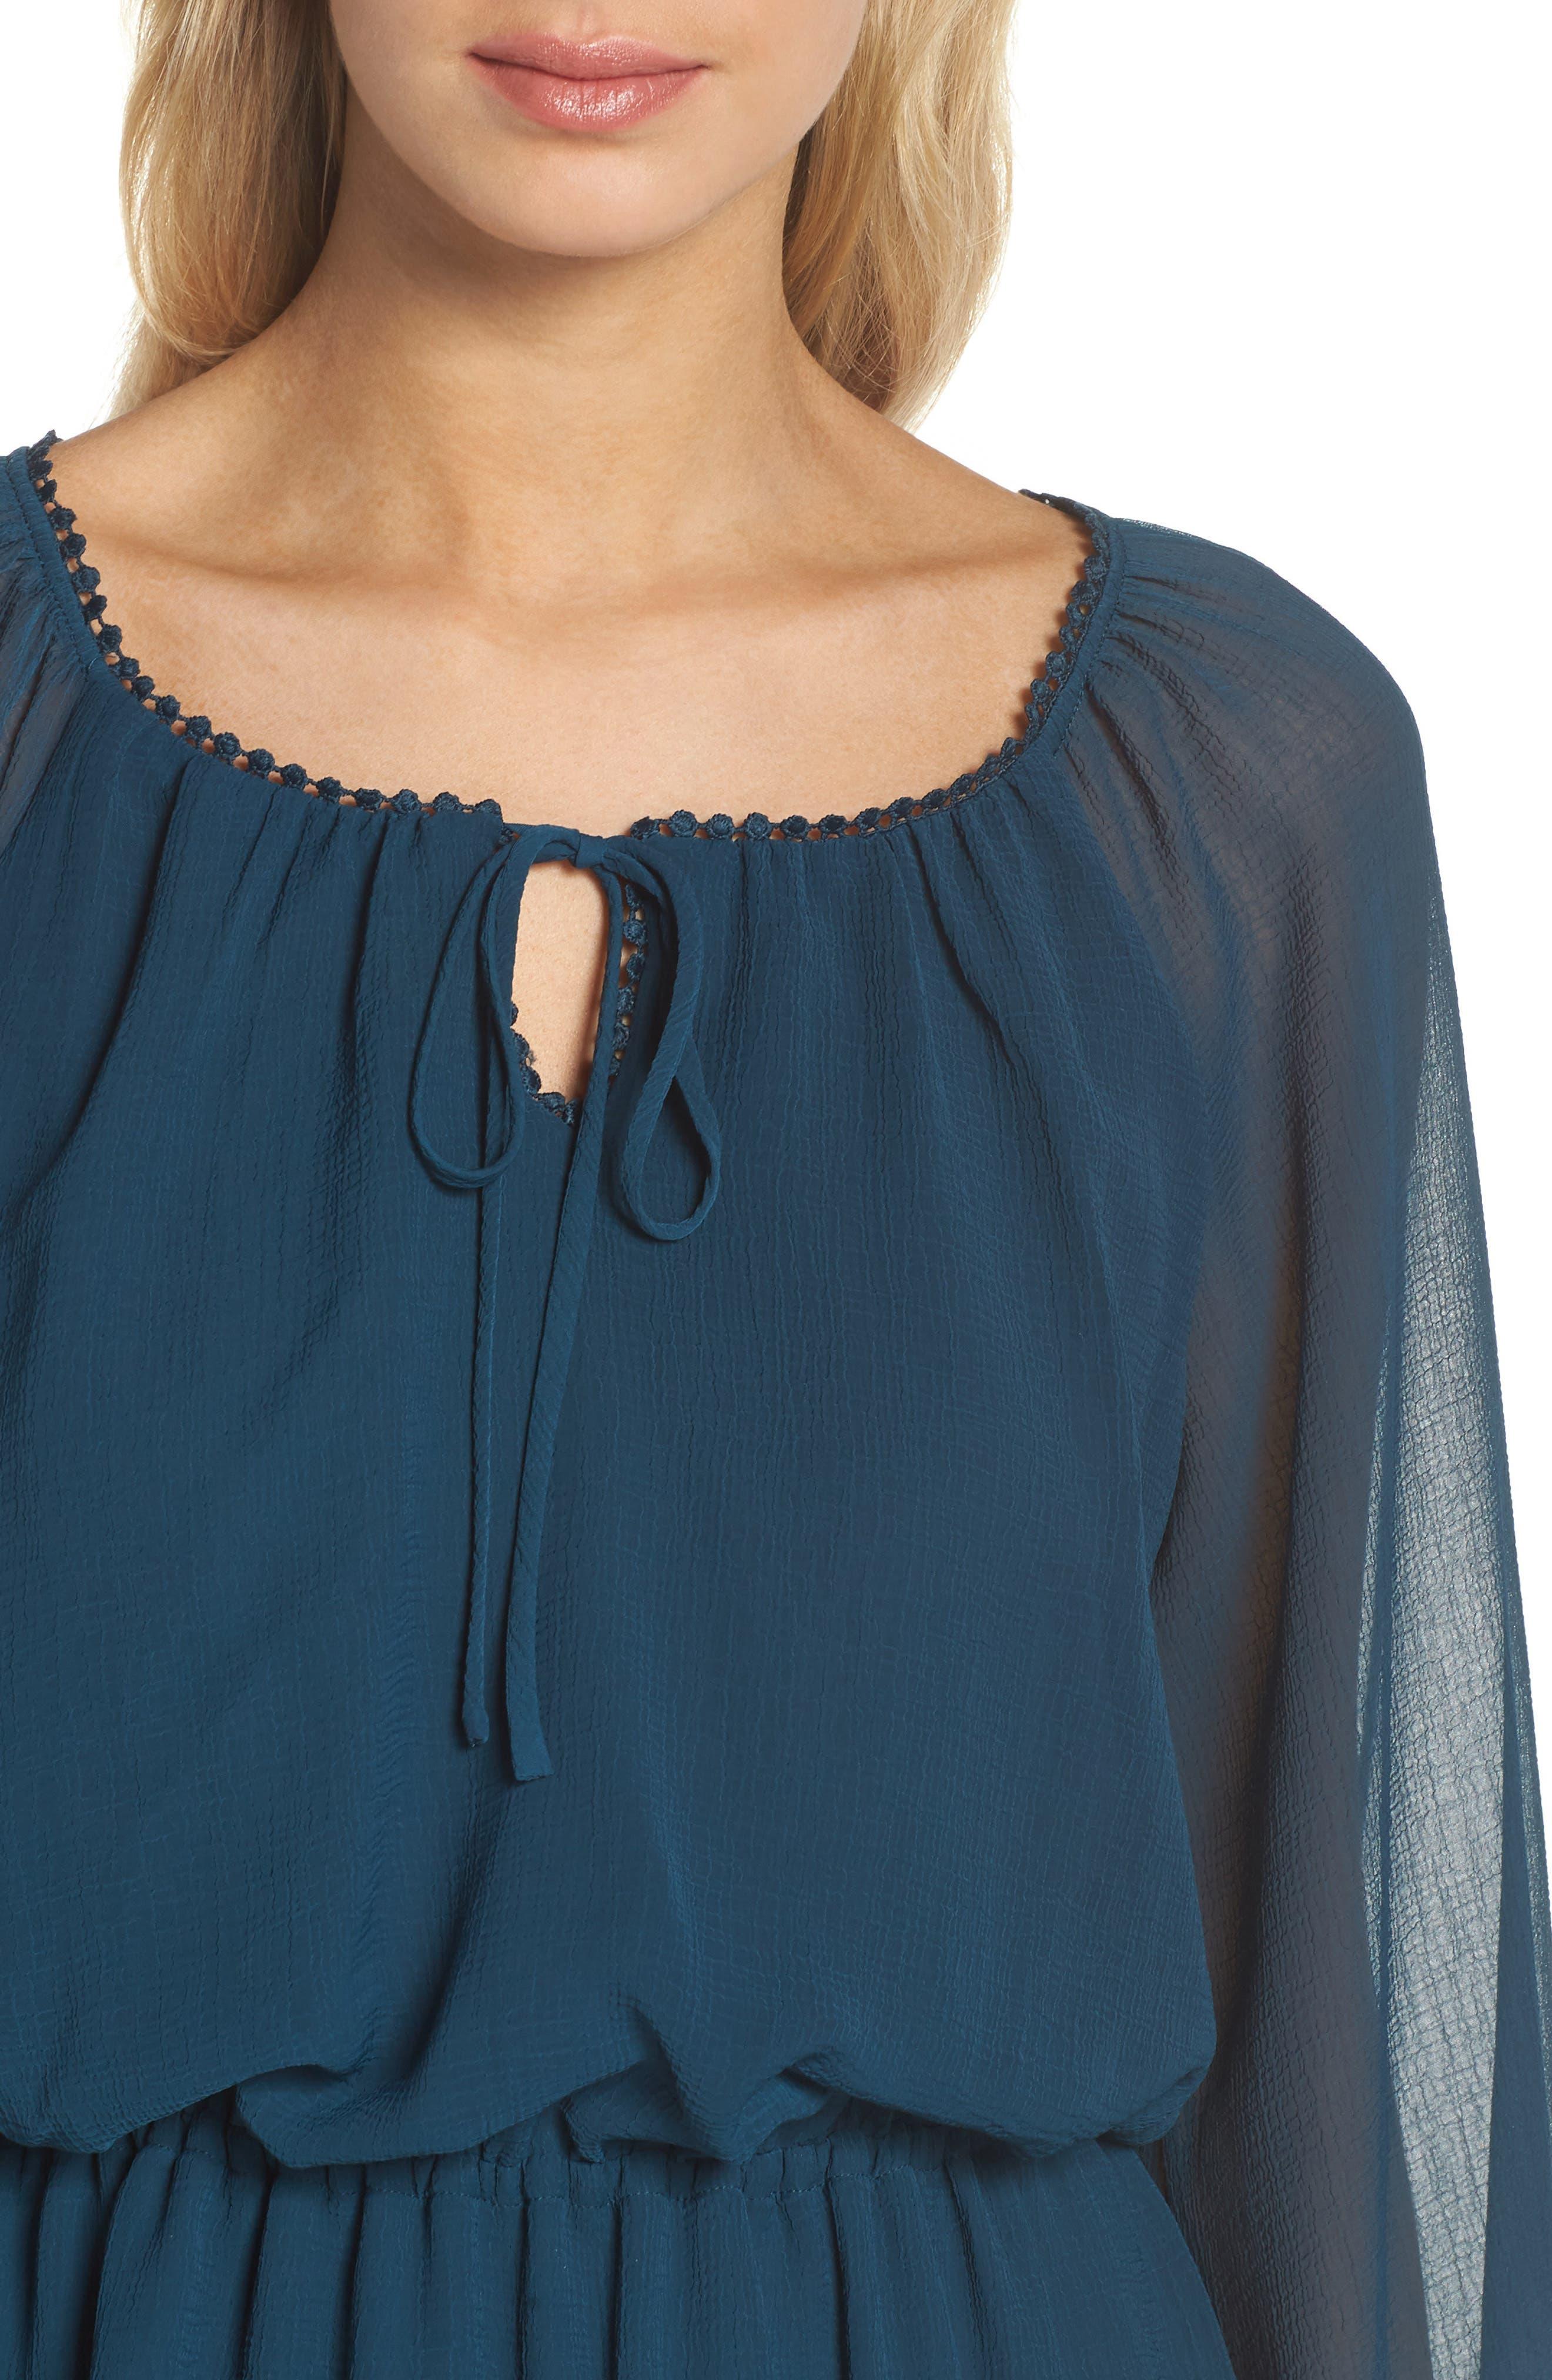 Bishop Sleeve Blouson Dress,                             Alternate thumbnail 4, color,                             441